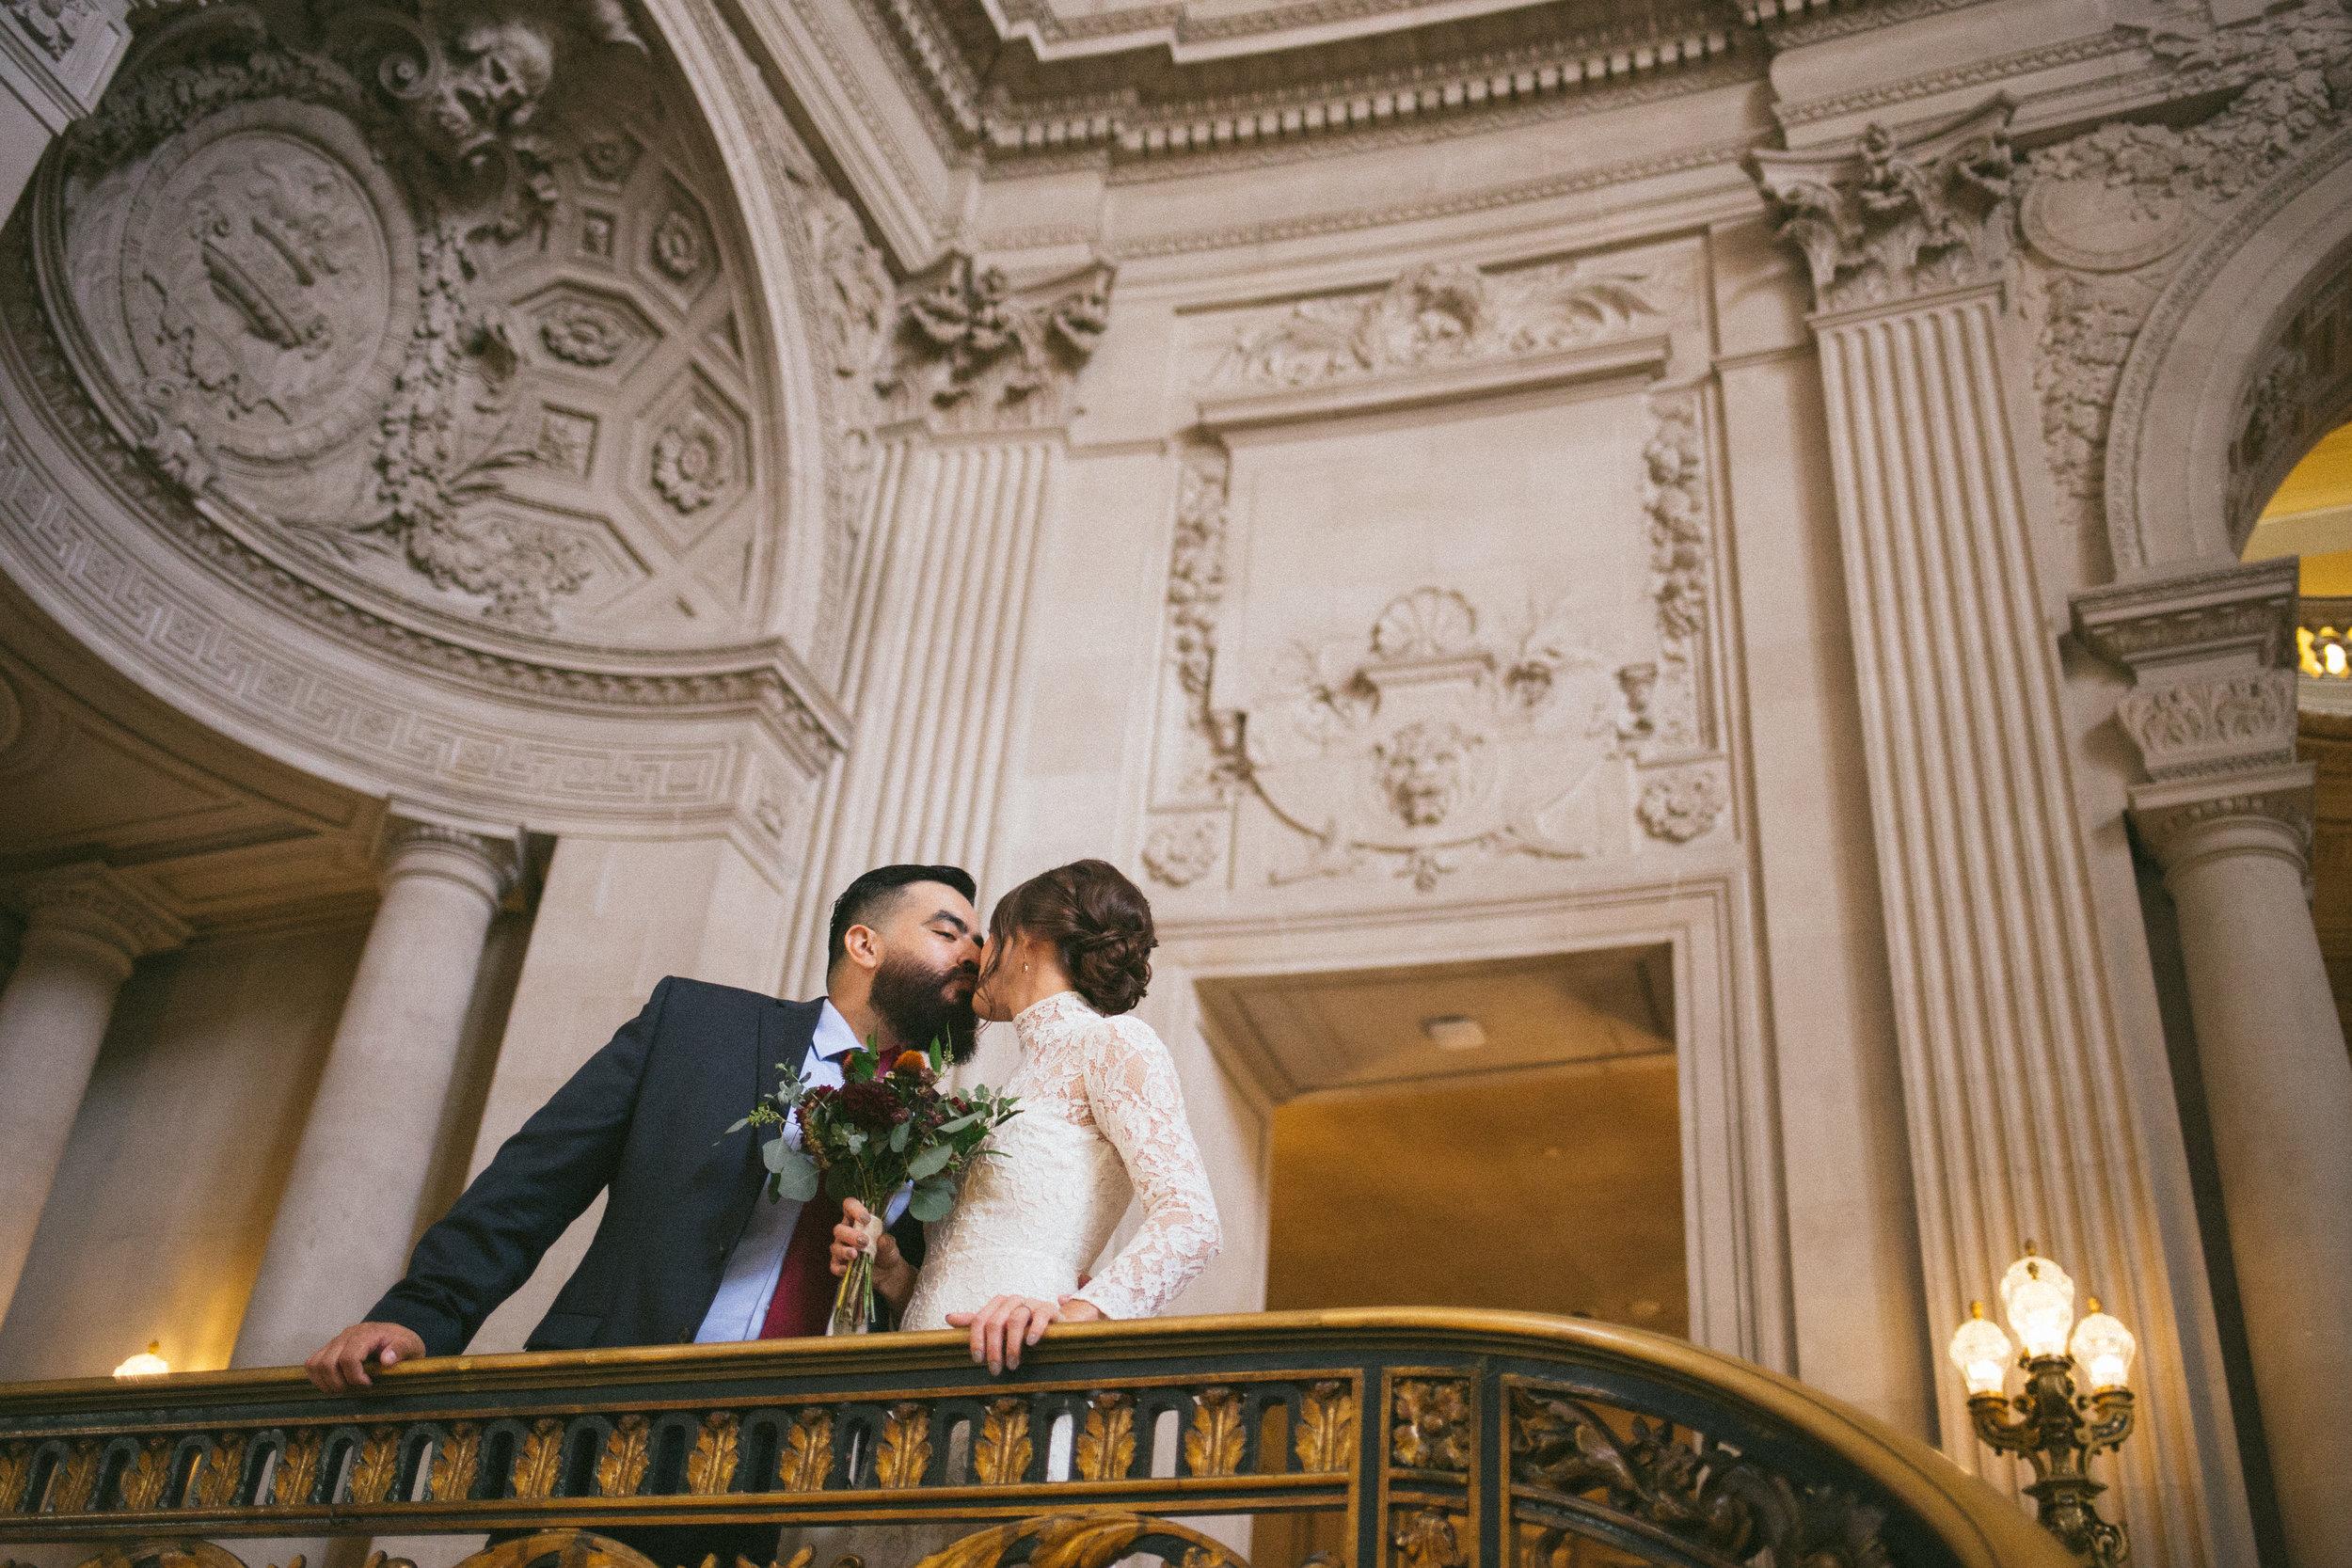 Natalie-Rogelio-Wedding-76.jpg